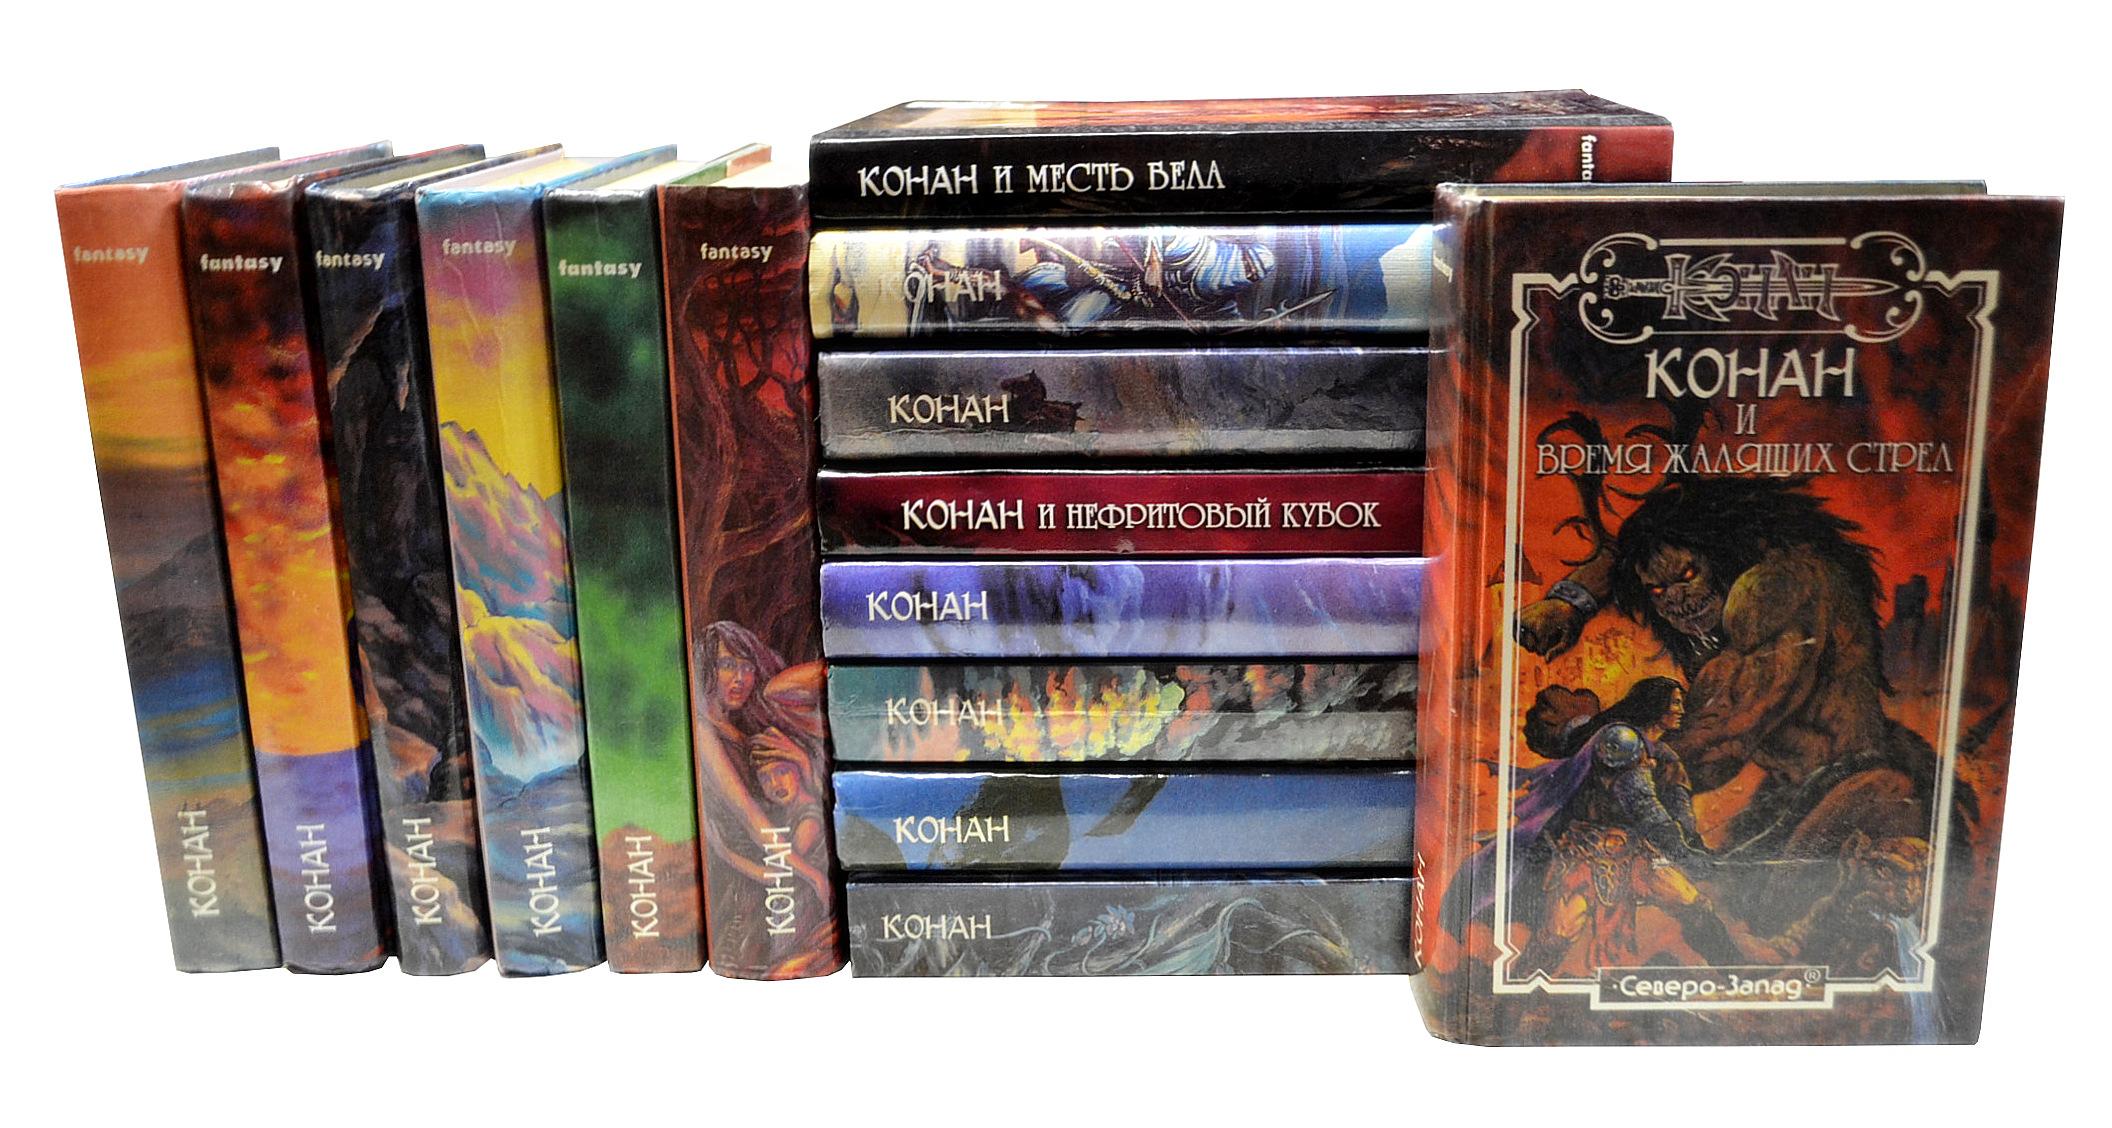 Серия Сага о Конане (комплект из 15 книг) ольга ожгибесова сага о